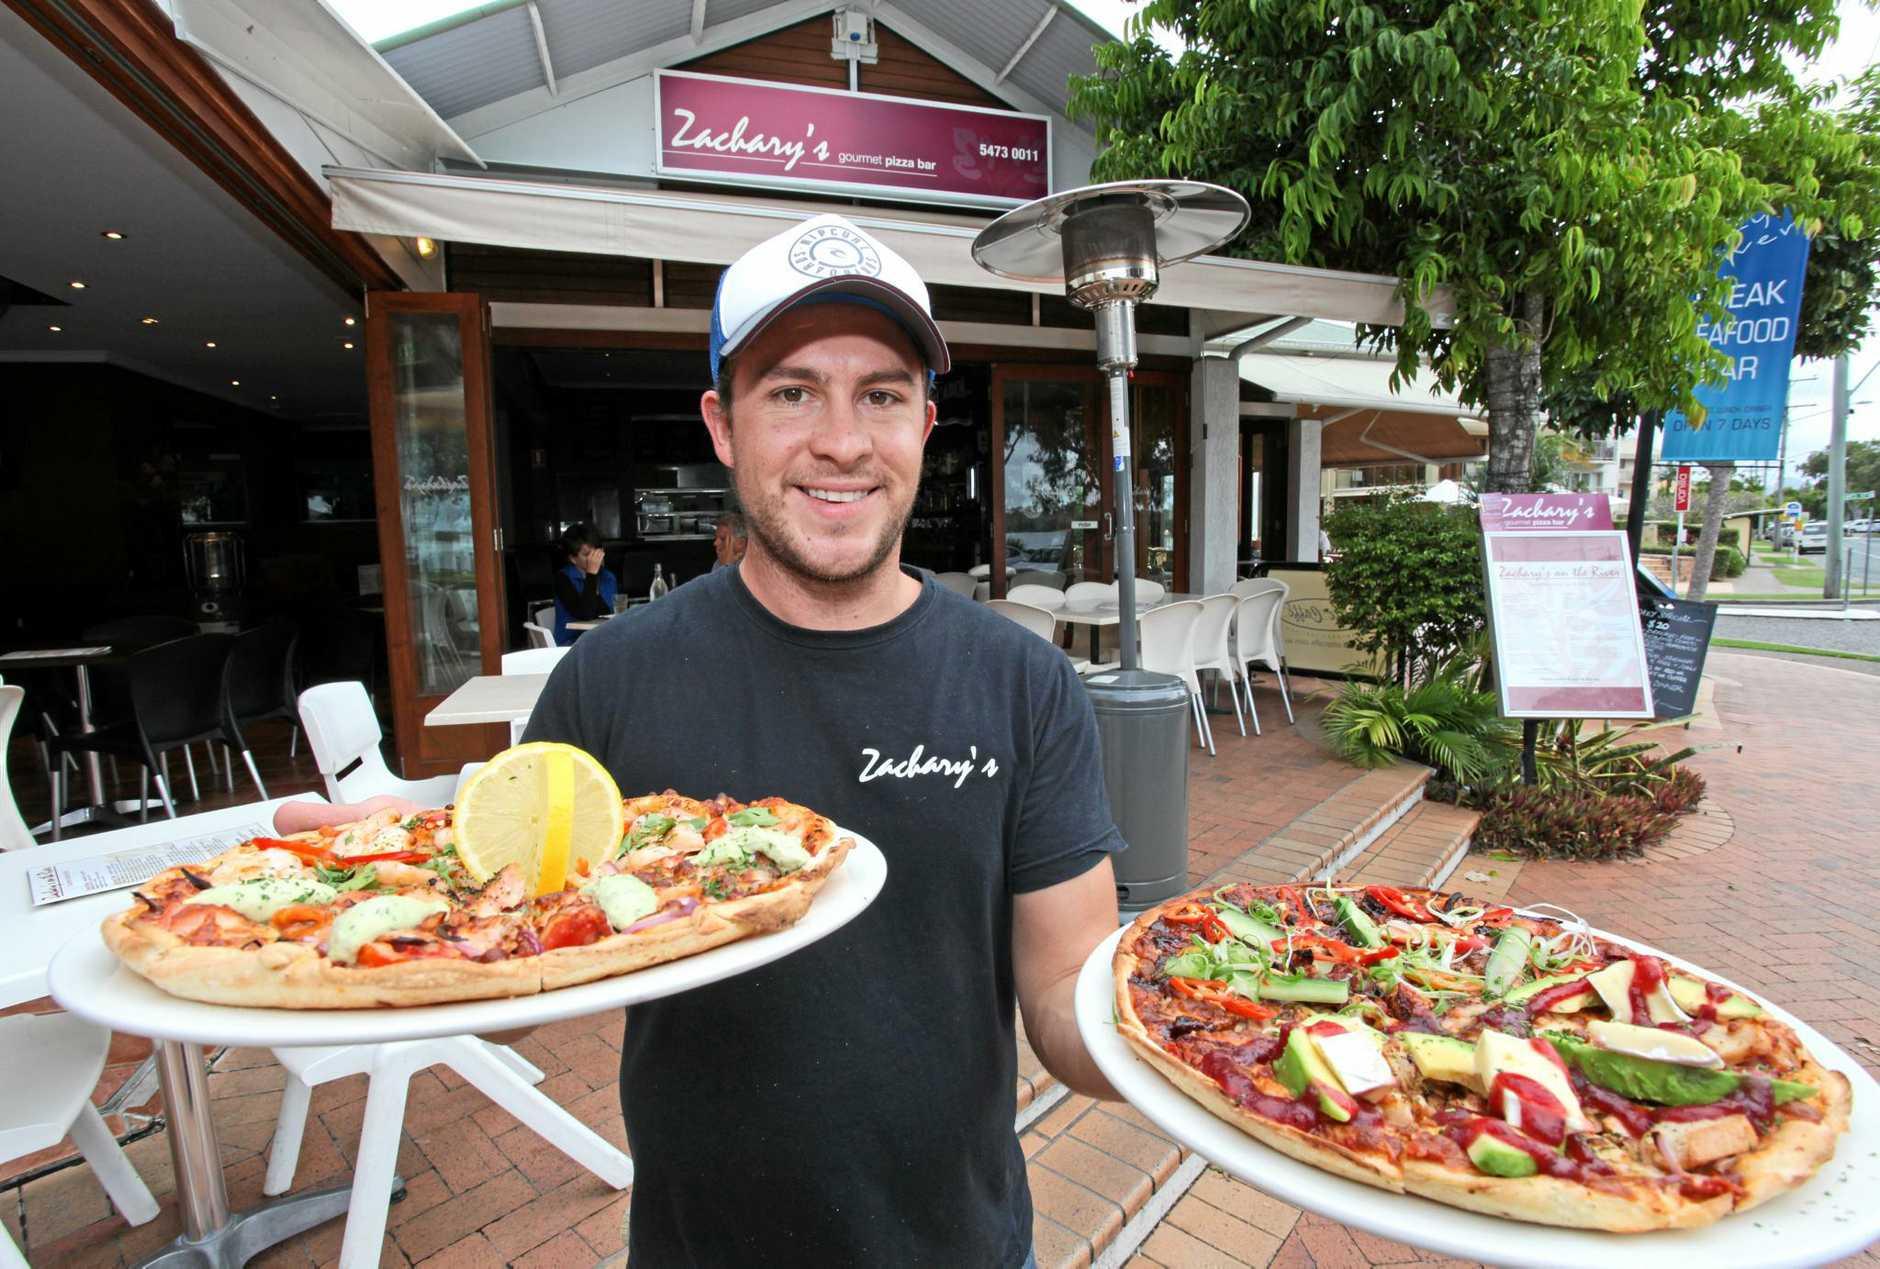 Kevin Chilton of Zachary's Gourmet Pizza Bar, Noosaville.